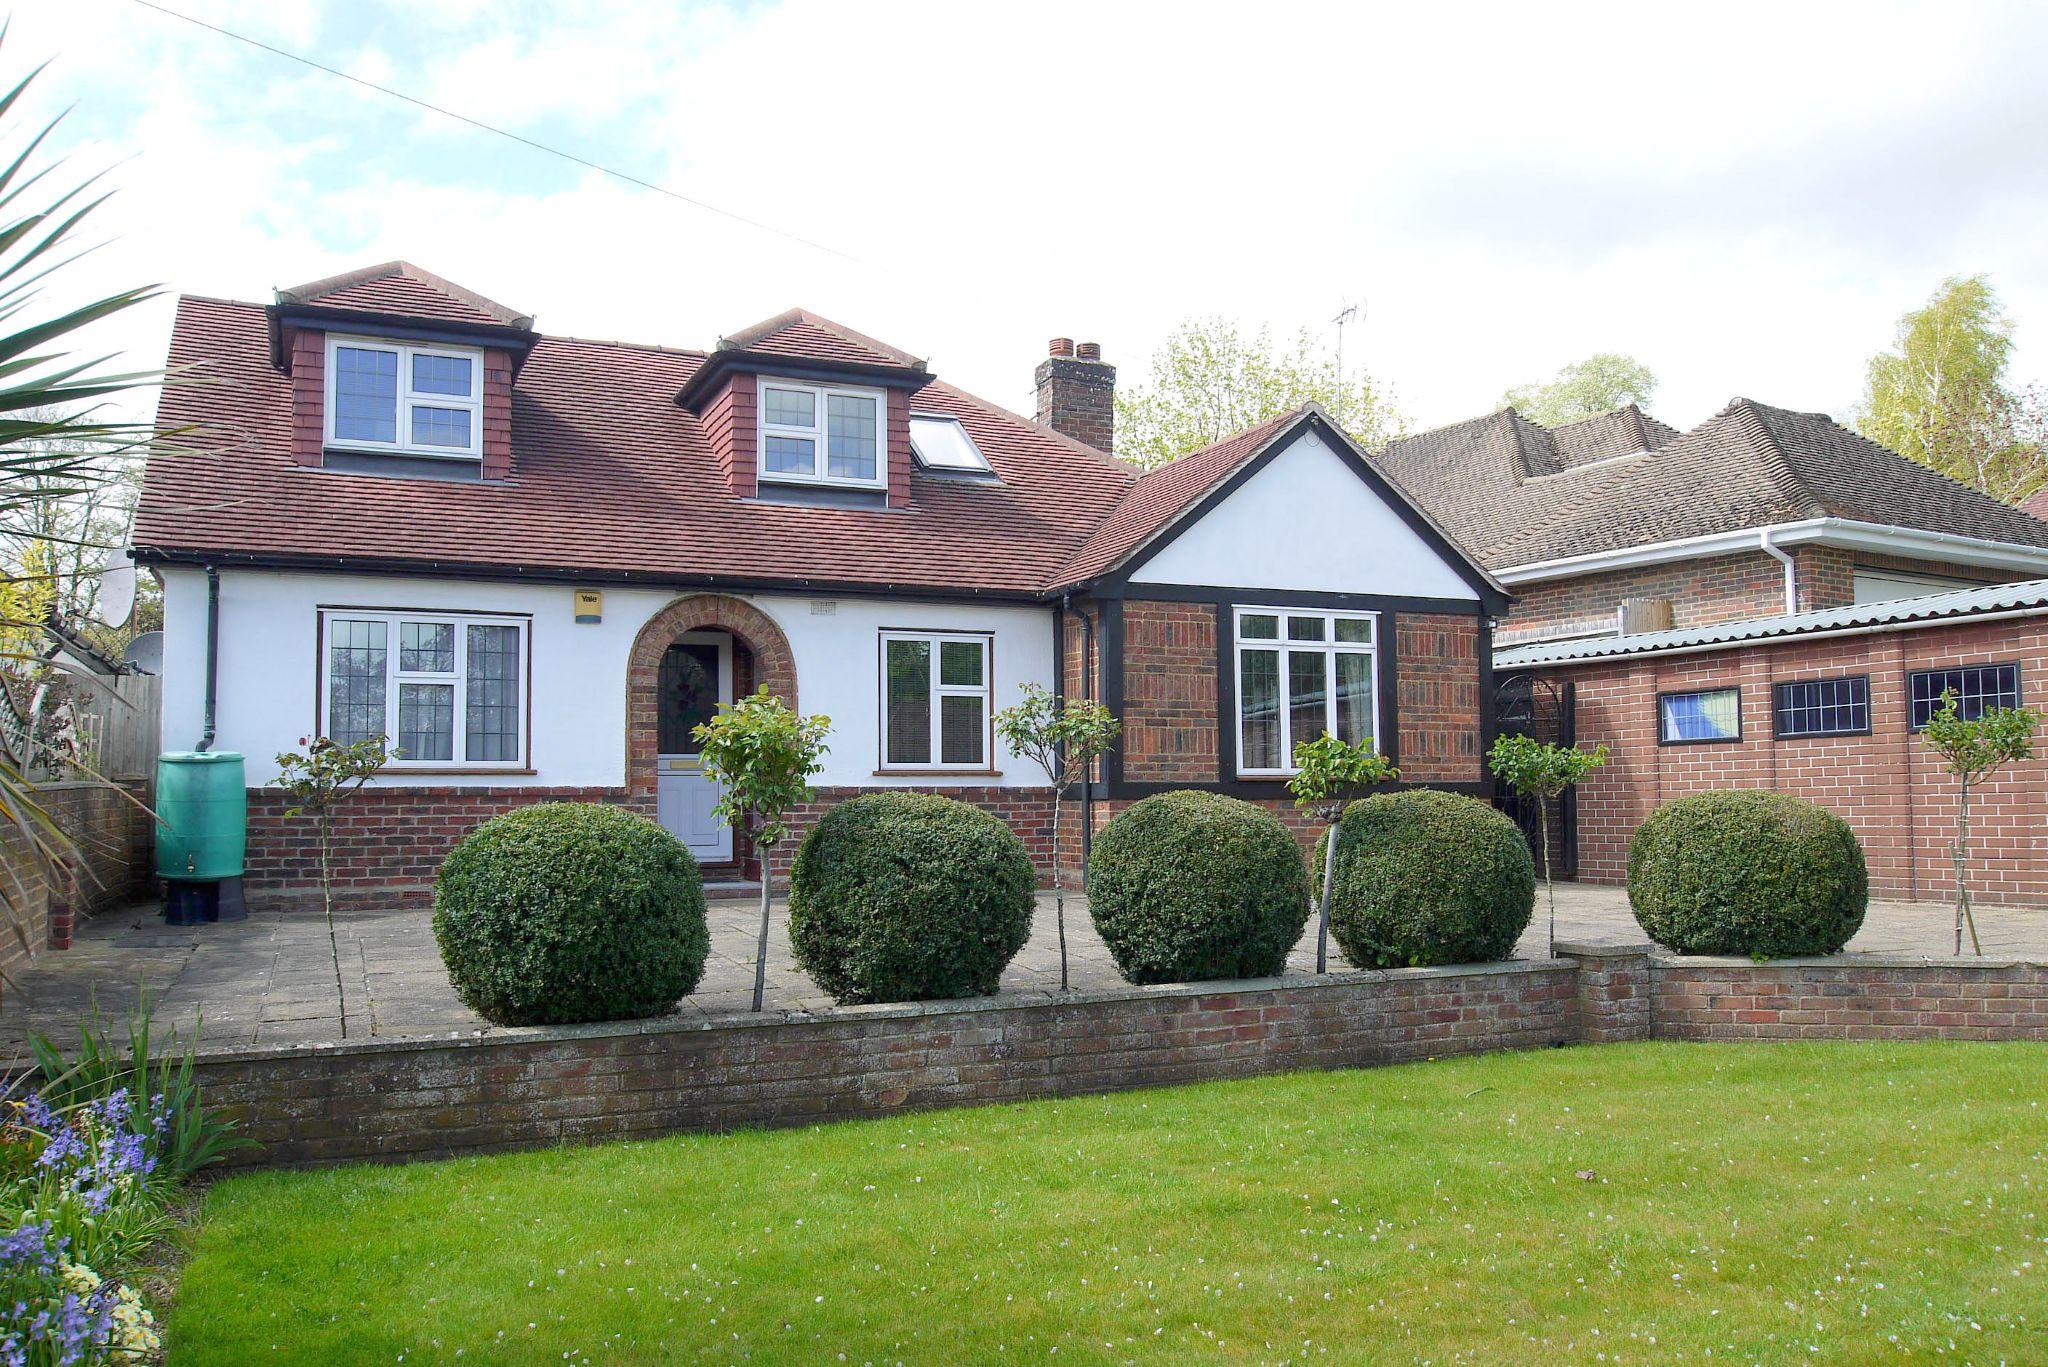 5 bedroom detached bungalow For Sale in Sevenoaks - Photograph 1